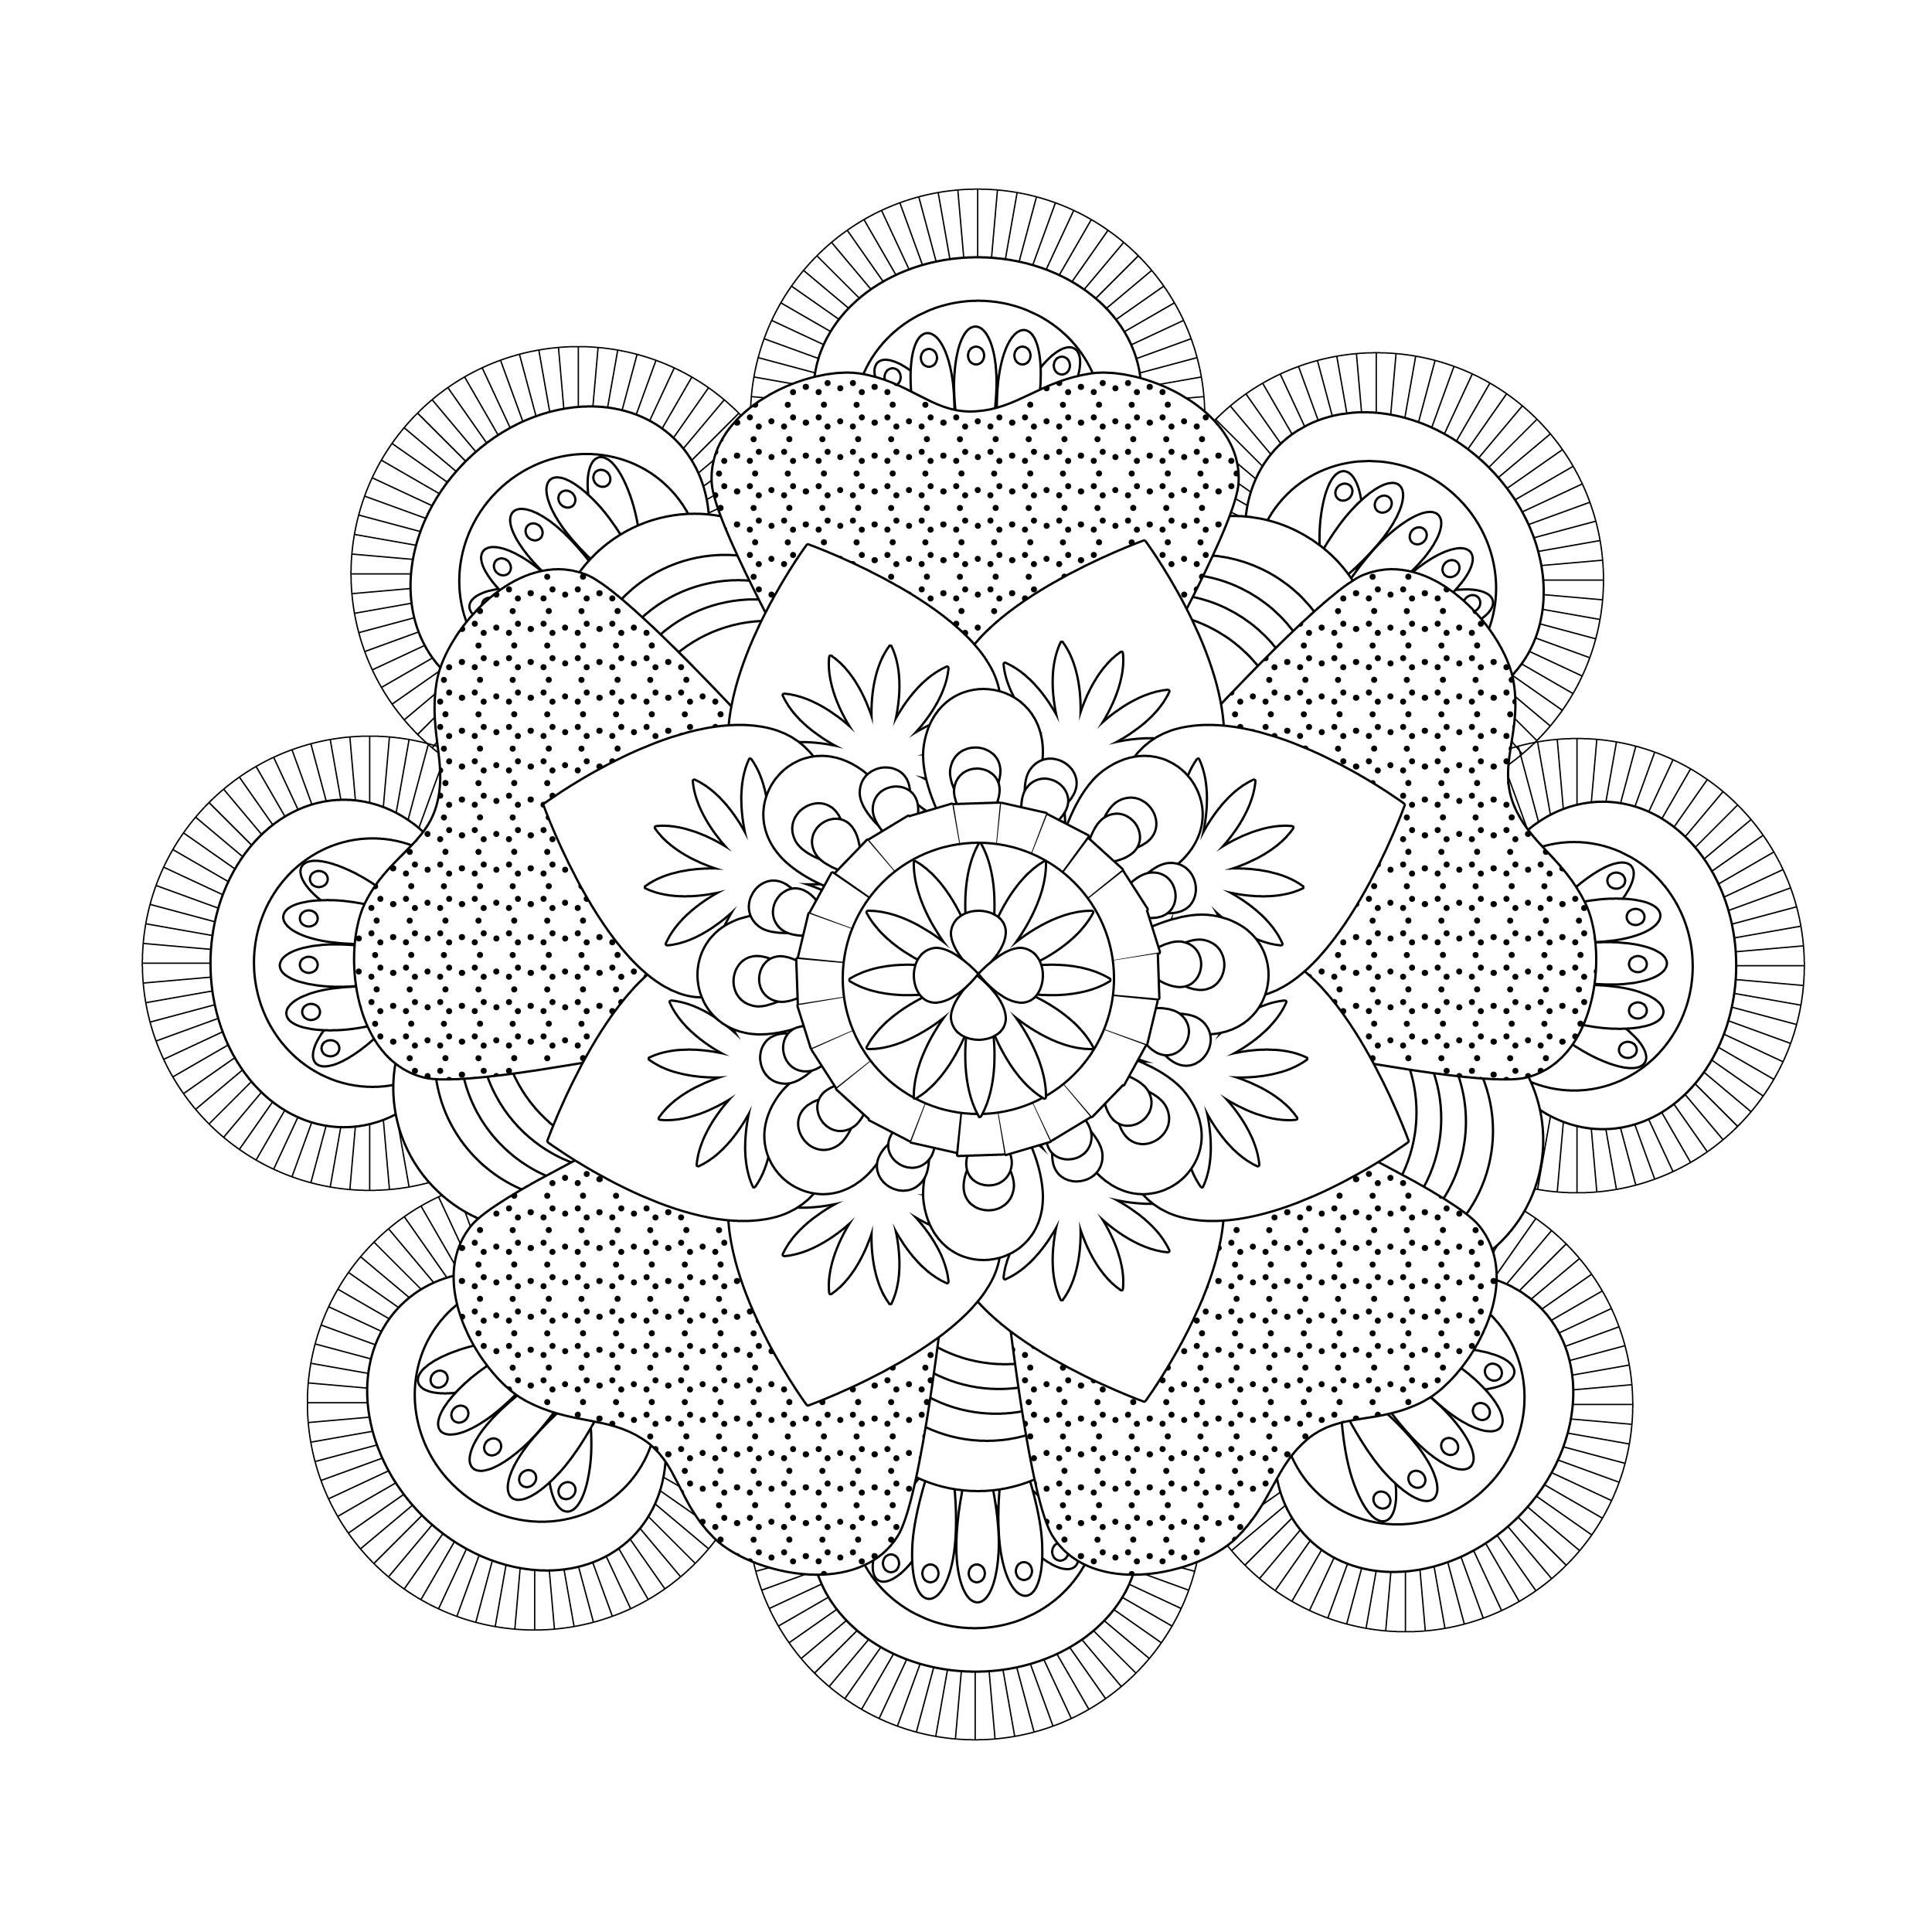 coloring mandalas free printable free printable mandala coloring pages for adults best printable mandalas free coloring